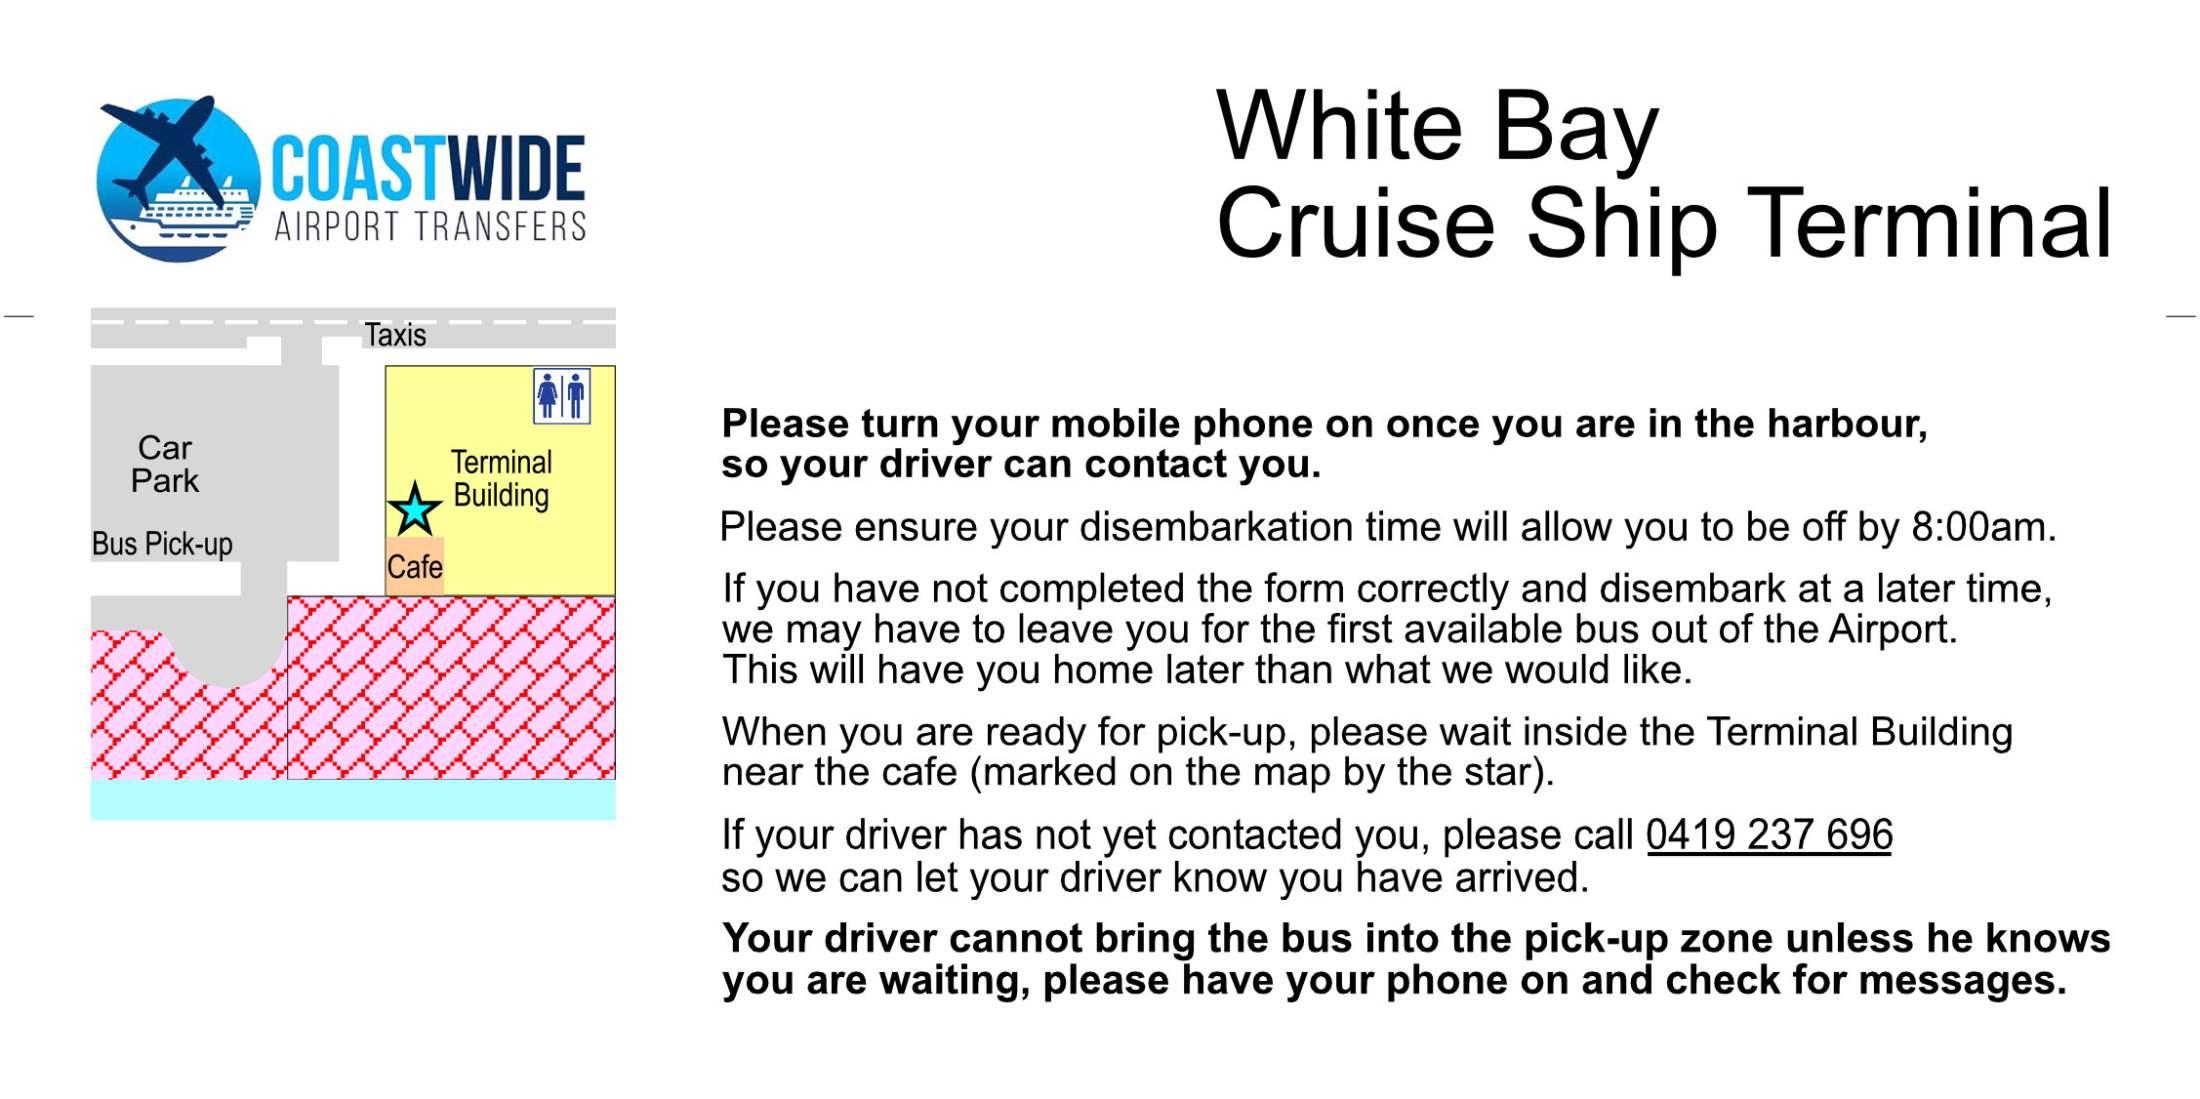 White Bay Cruise Ship Terminal